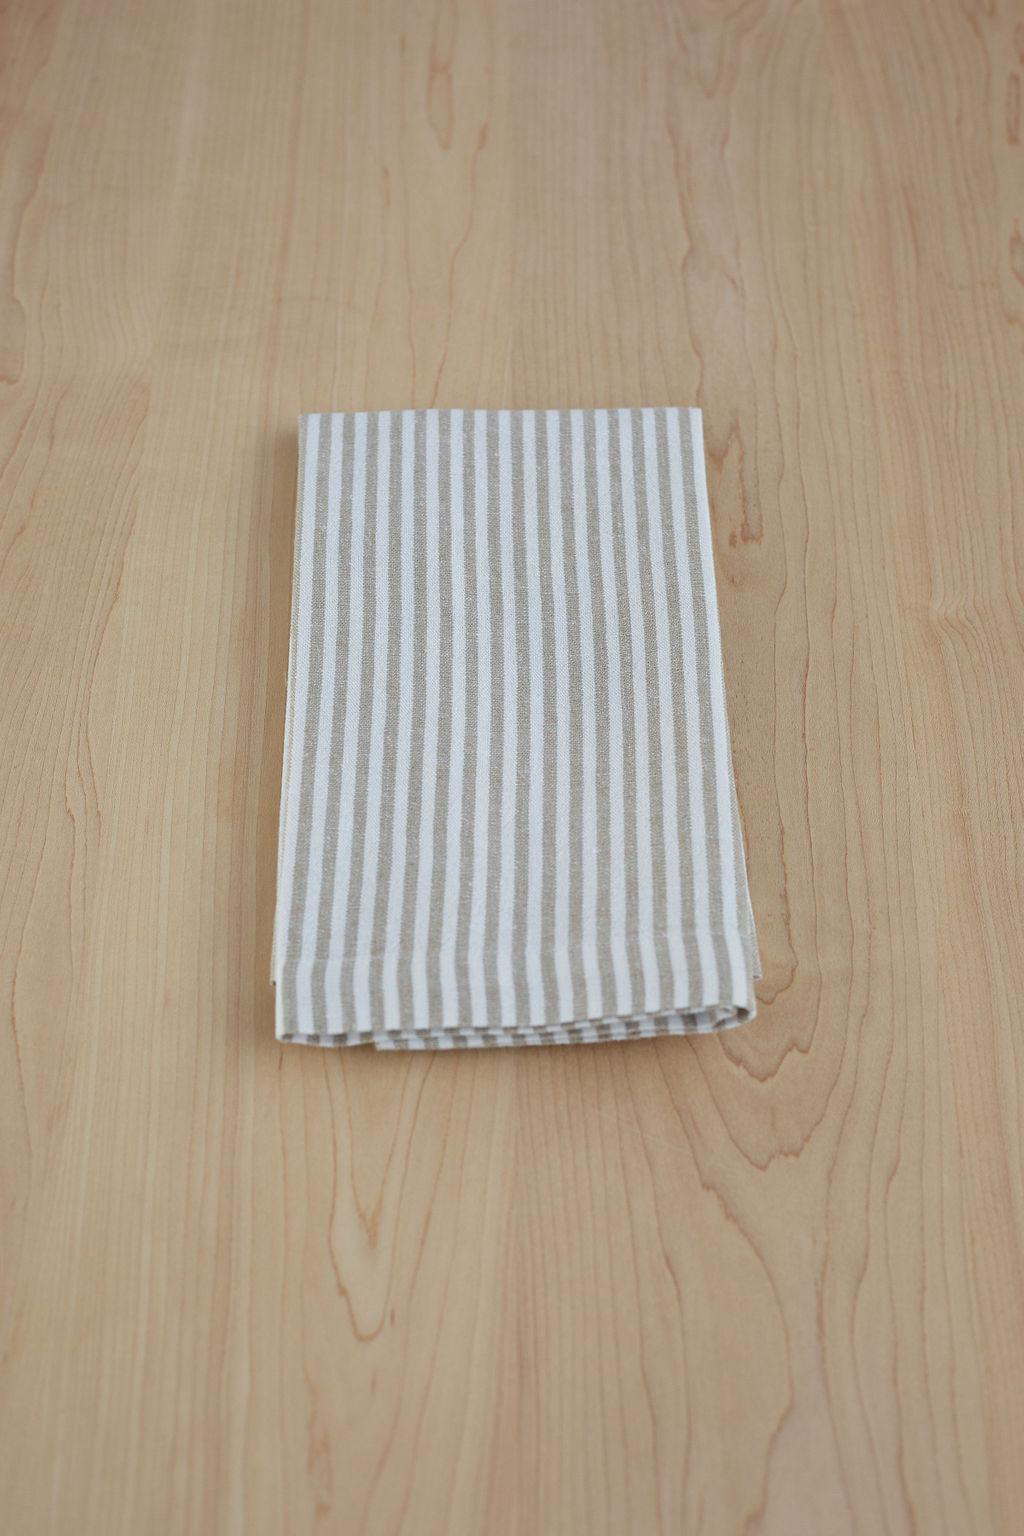 Mini Stripe in Flax Napkin.jpg